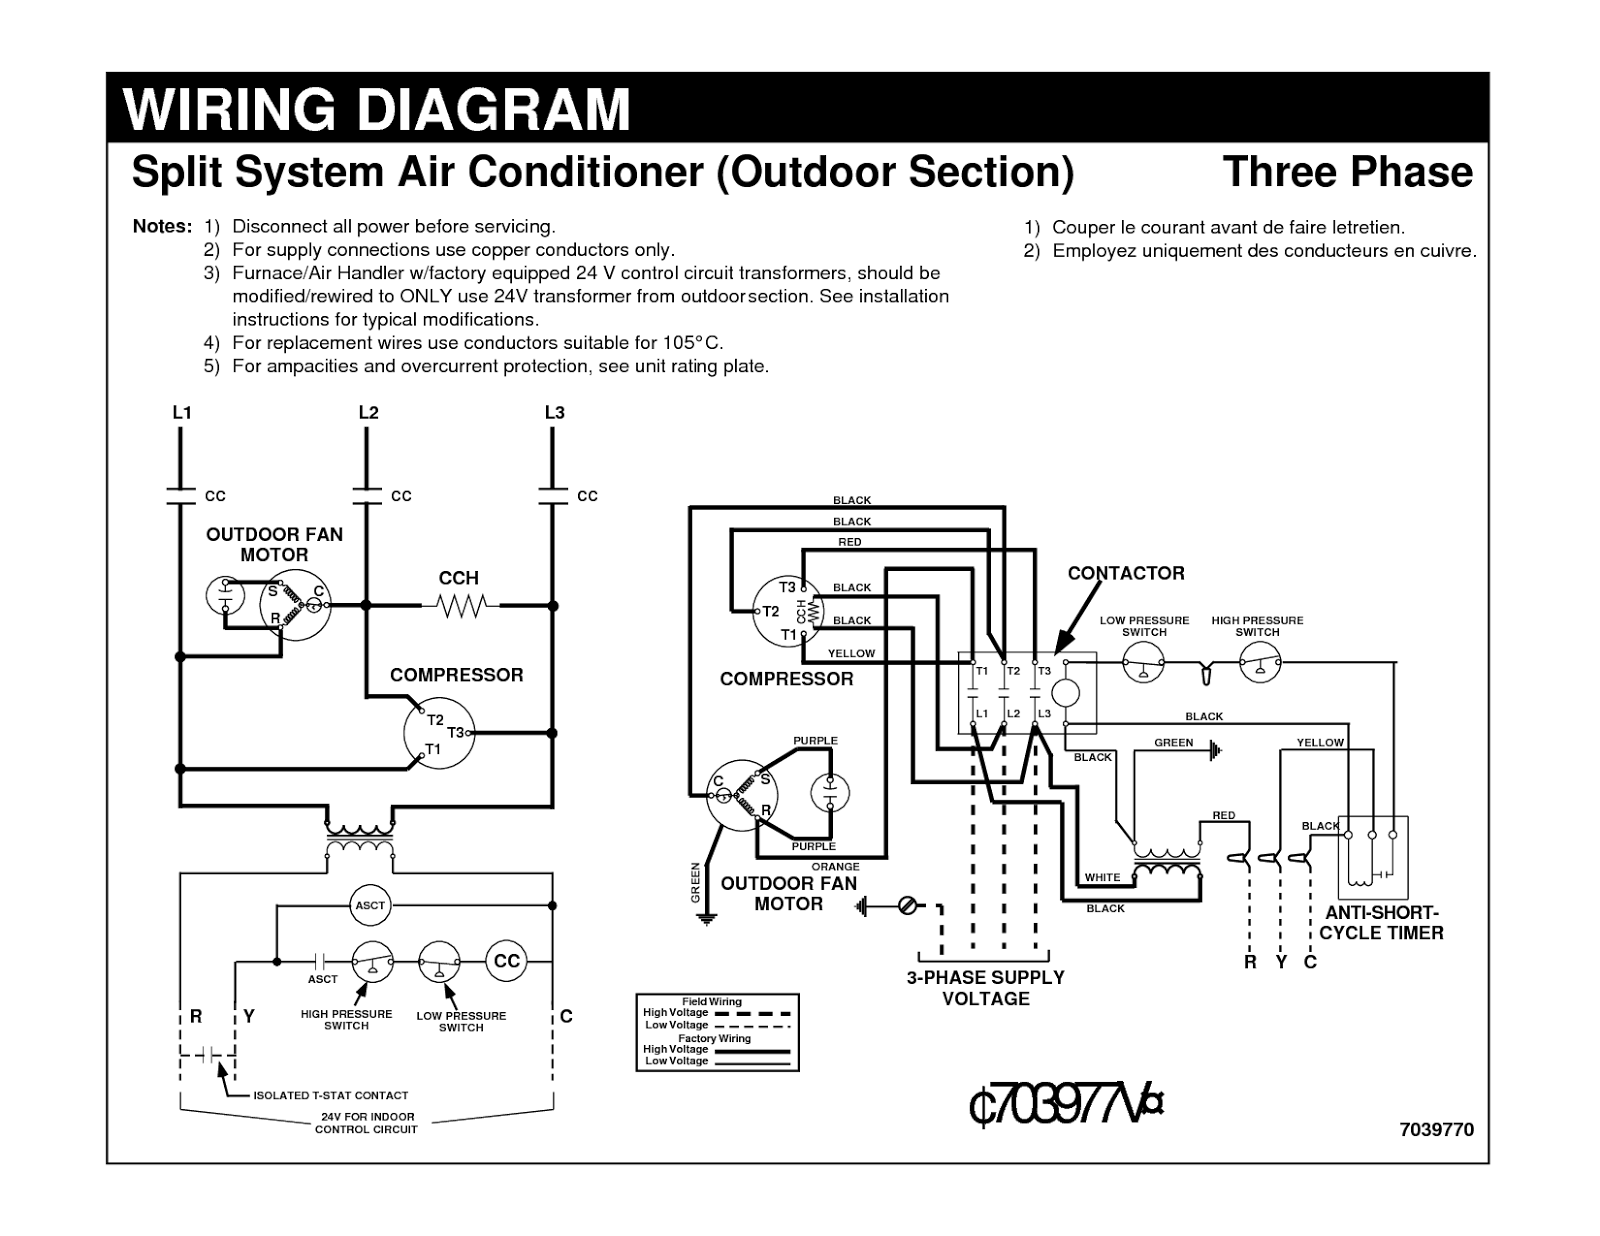 Hvac Wiring Guide - Wiring Diagram 500 on solar electrical connections diagrams, nec breaker box wiring, nec wiring solar, nec wiring codes, nec wiring symbols, nec gfci breaker diagram,